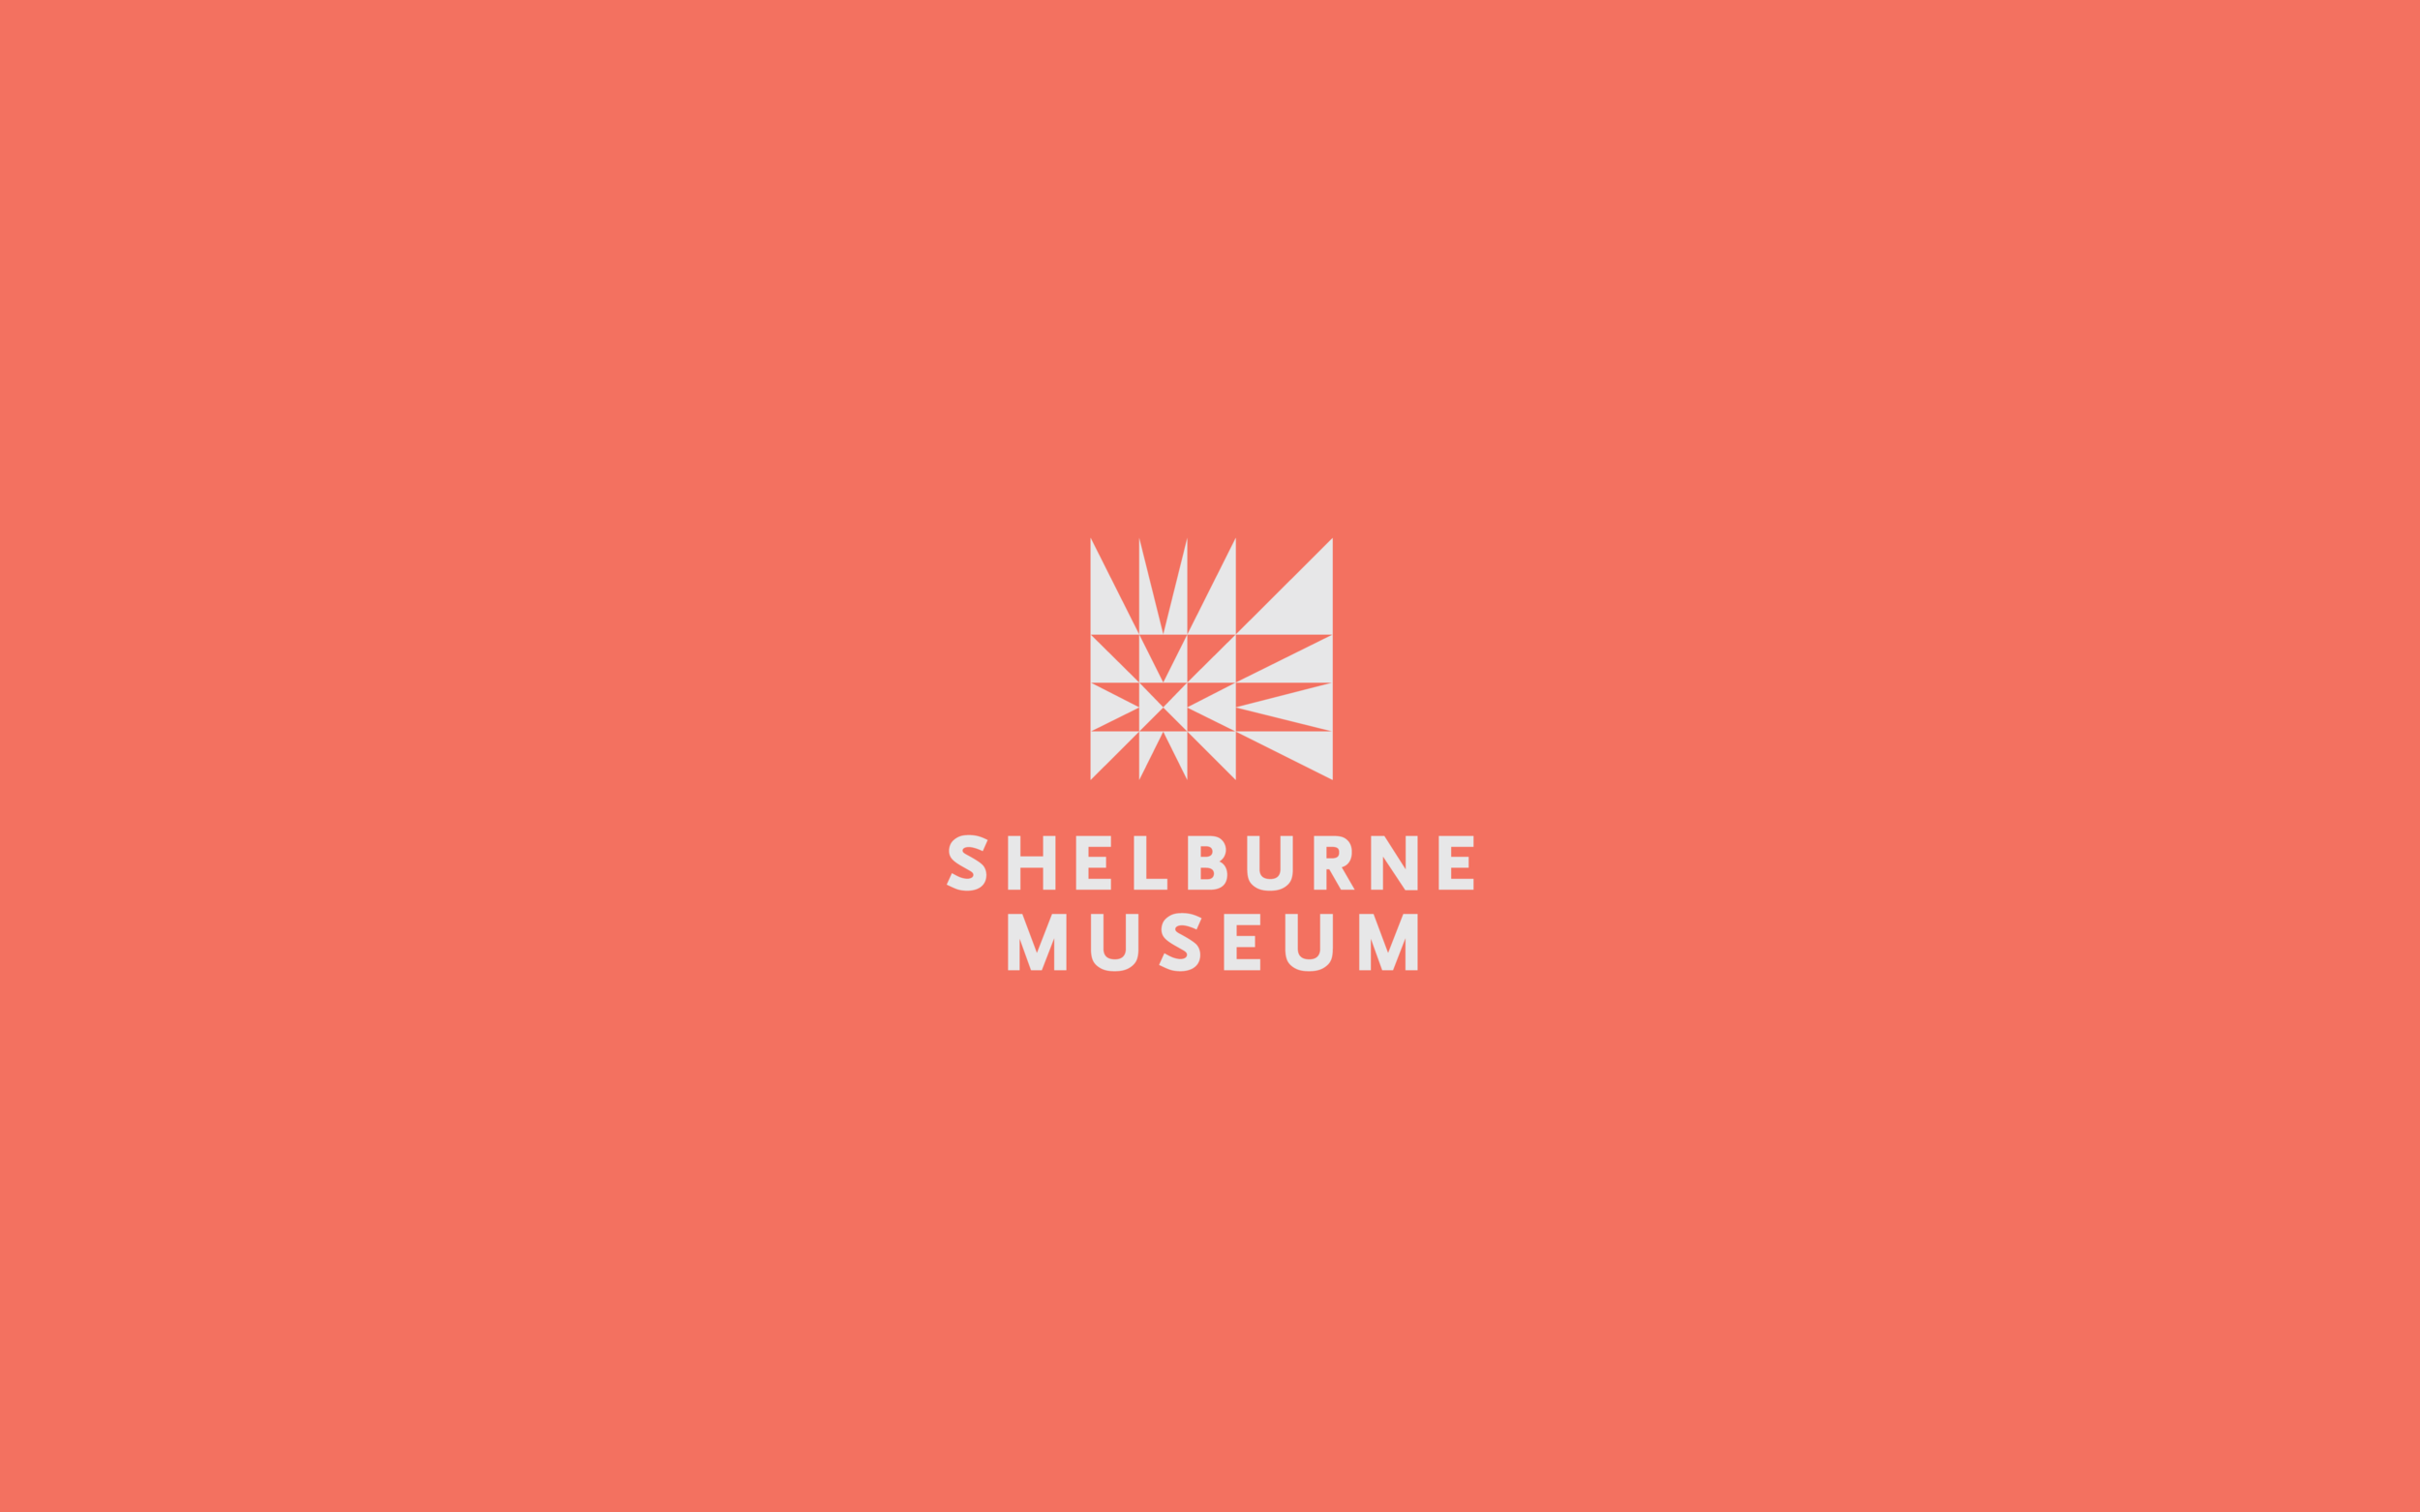 StirlingAdams_ShelburneMuseum_Draft2_030619_V2.png